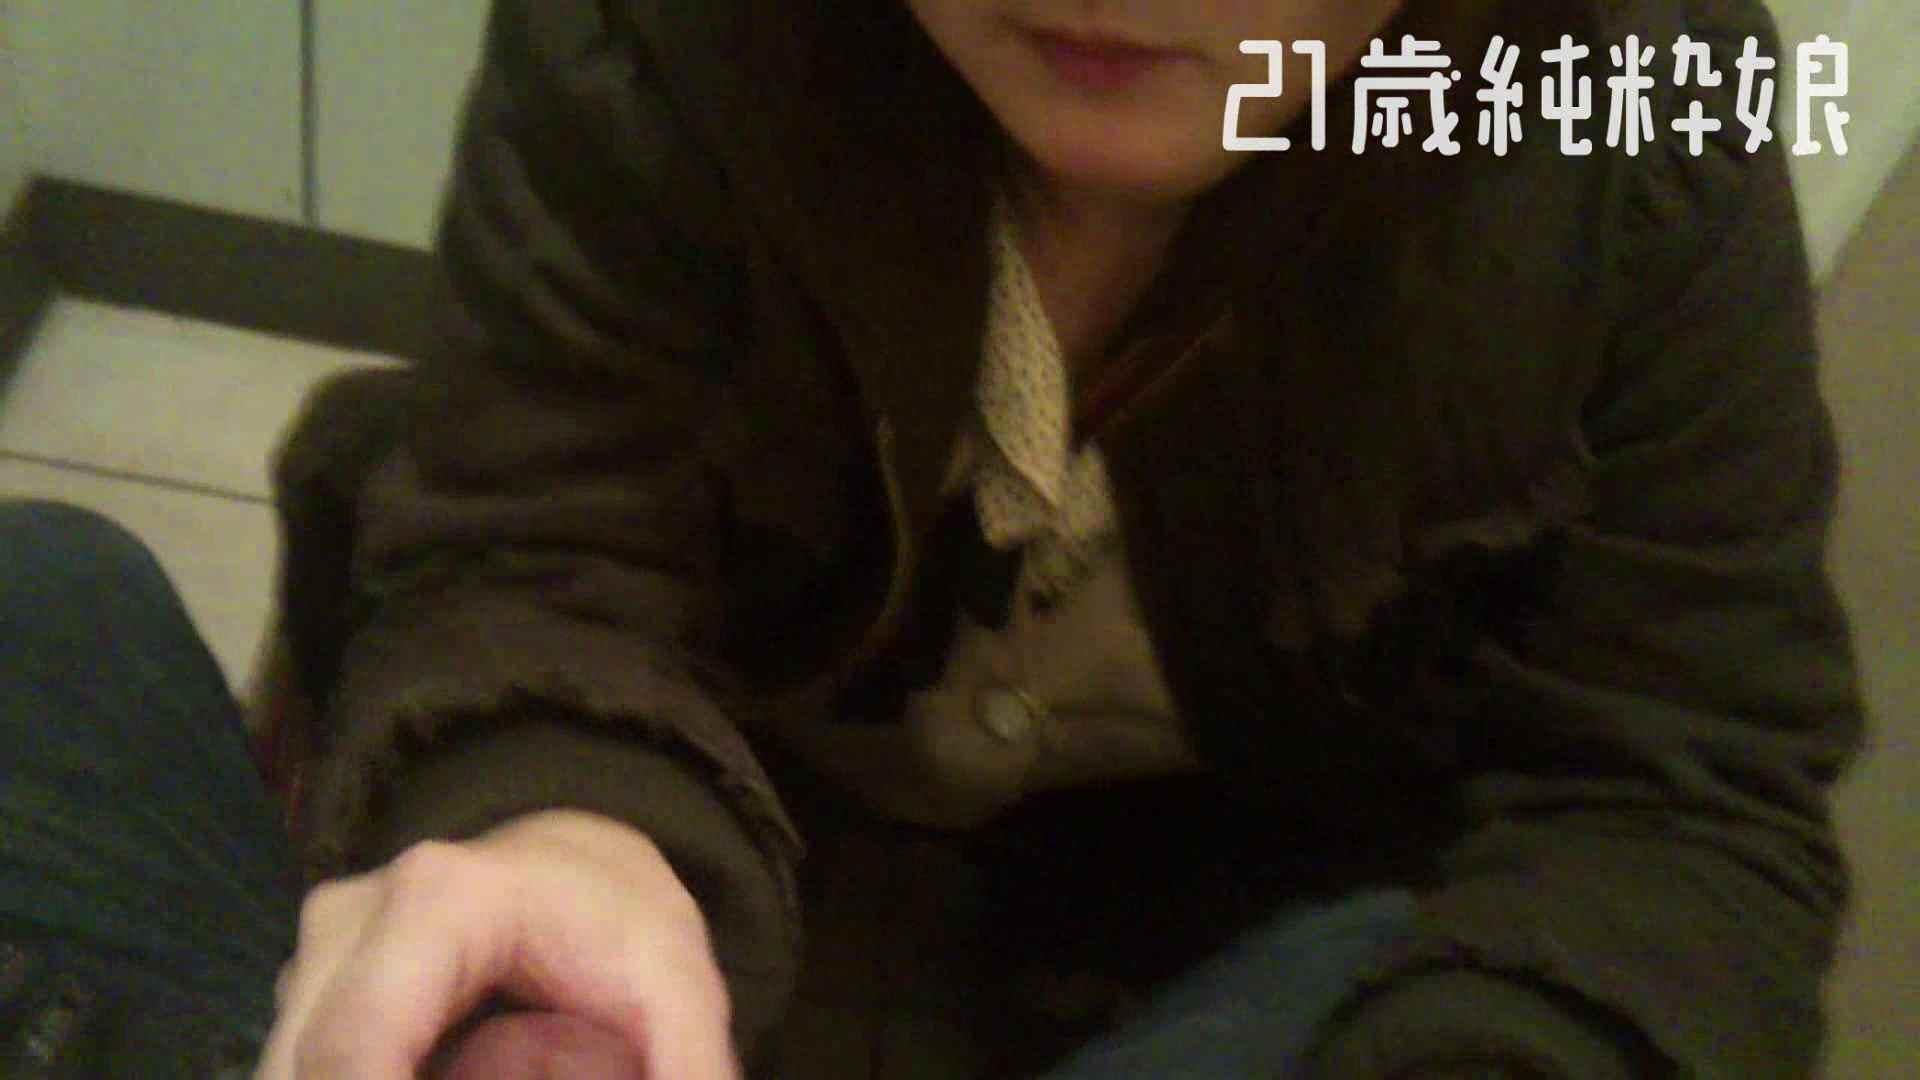 Gカップ21歳純粋嬢第2弾Vol.5 性欲丸出し | 学校  101pic 70